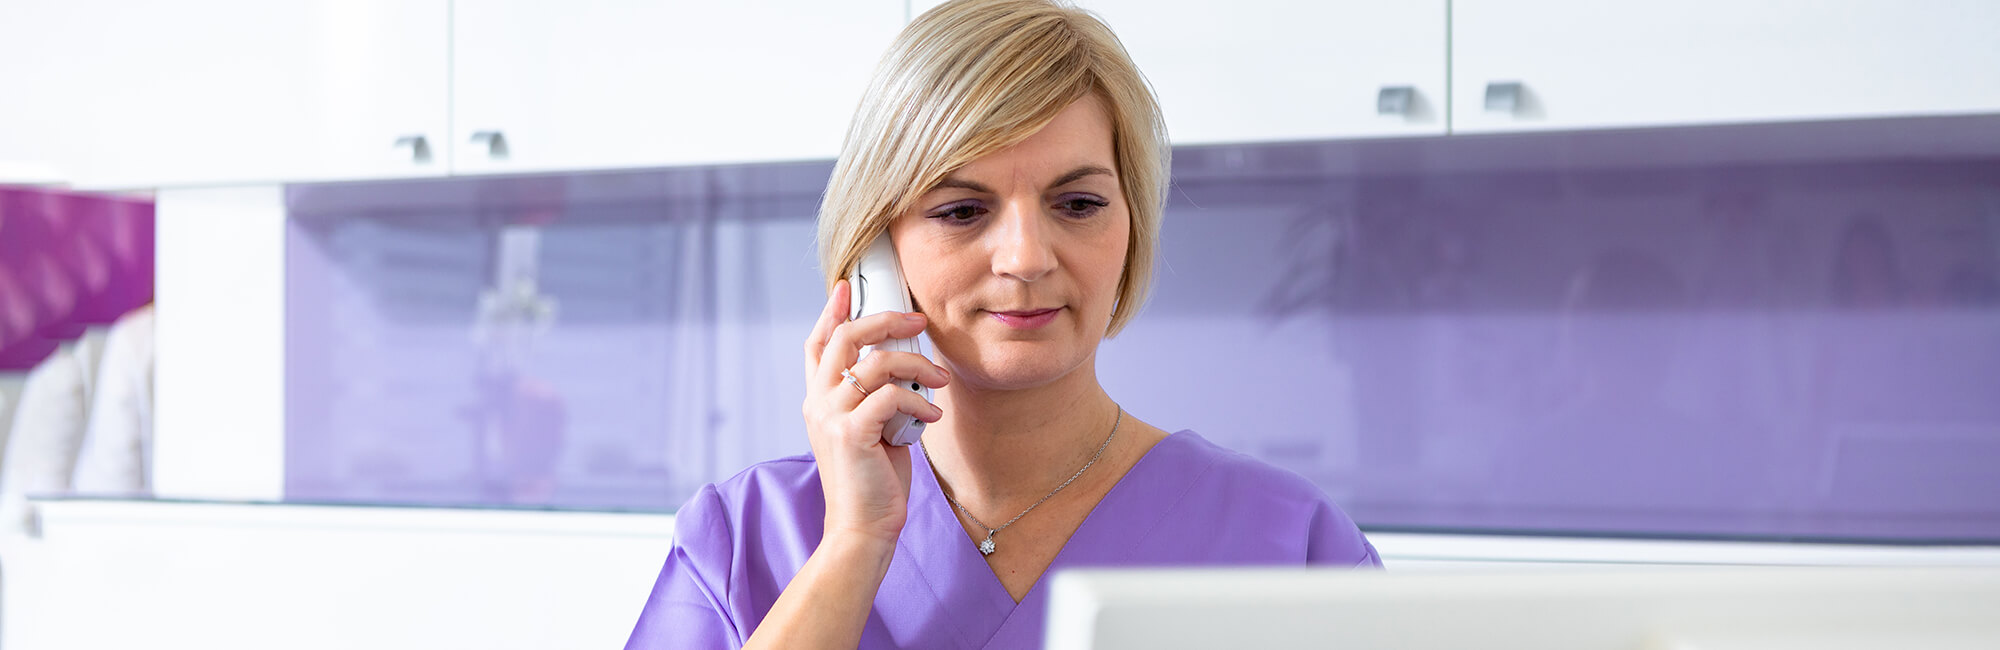 Zahnarzt Klosterneuburg - Dr. Sandra Dusek - Slider Kontakt Frau Patzak